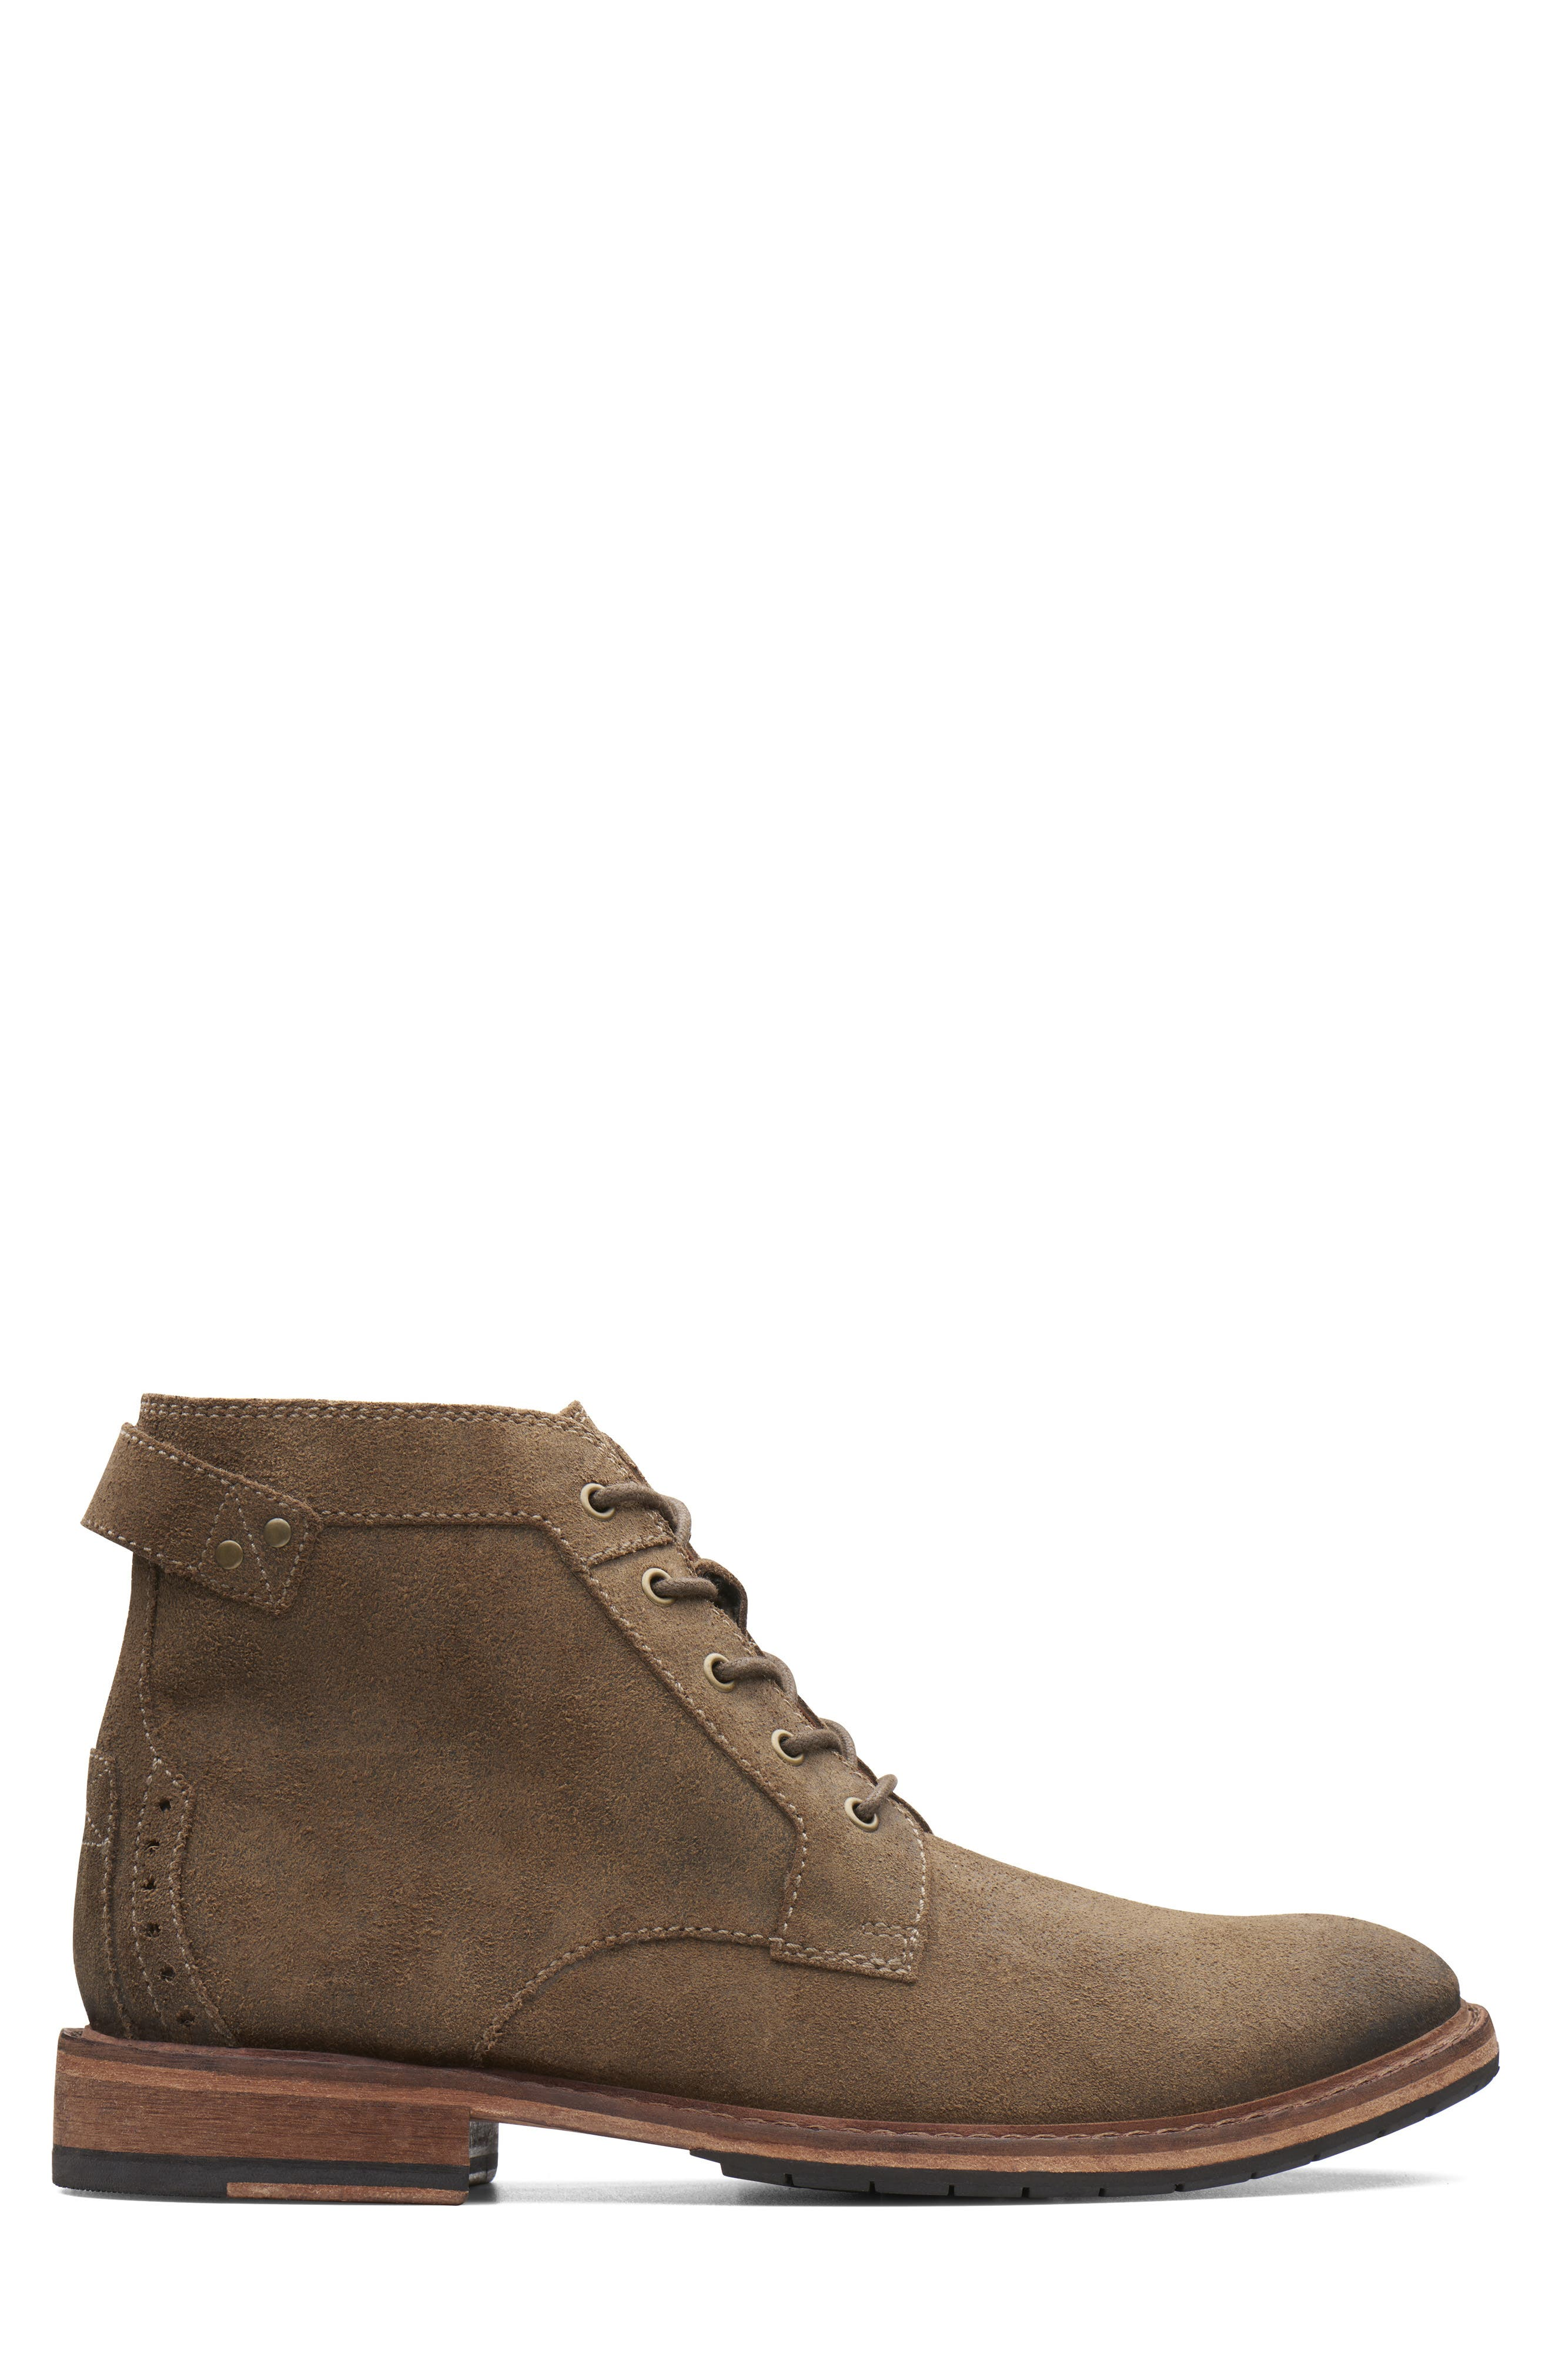 Clarkdale Bud Plain Toe Boot,                             Alternate thumbnail 2, color,                             KHAKI SUEDE